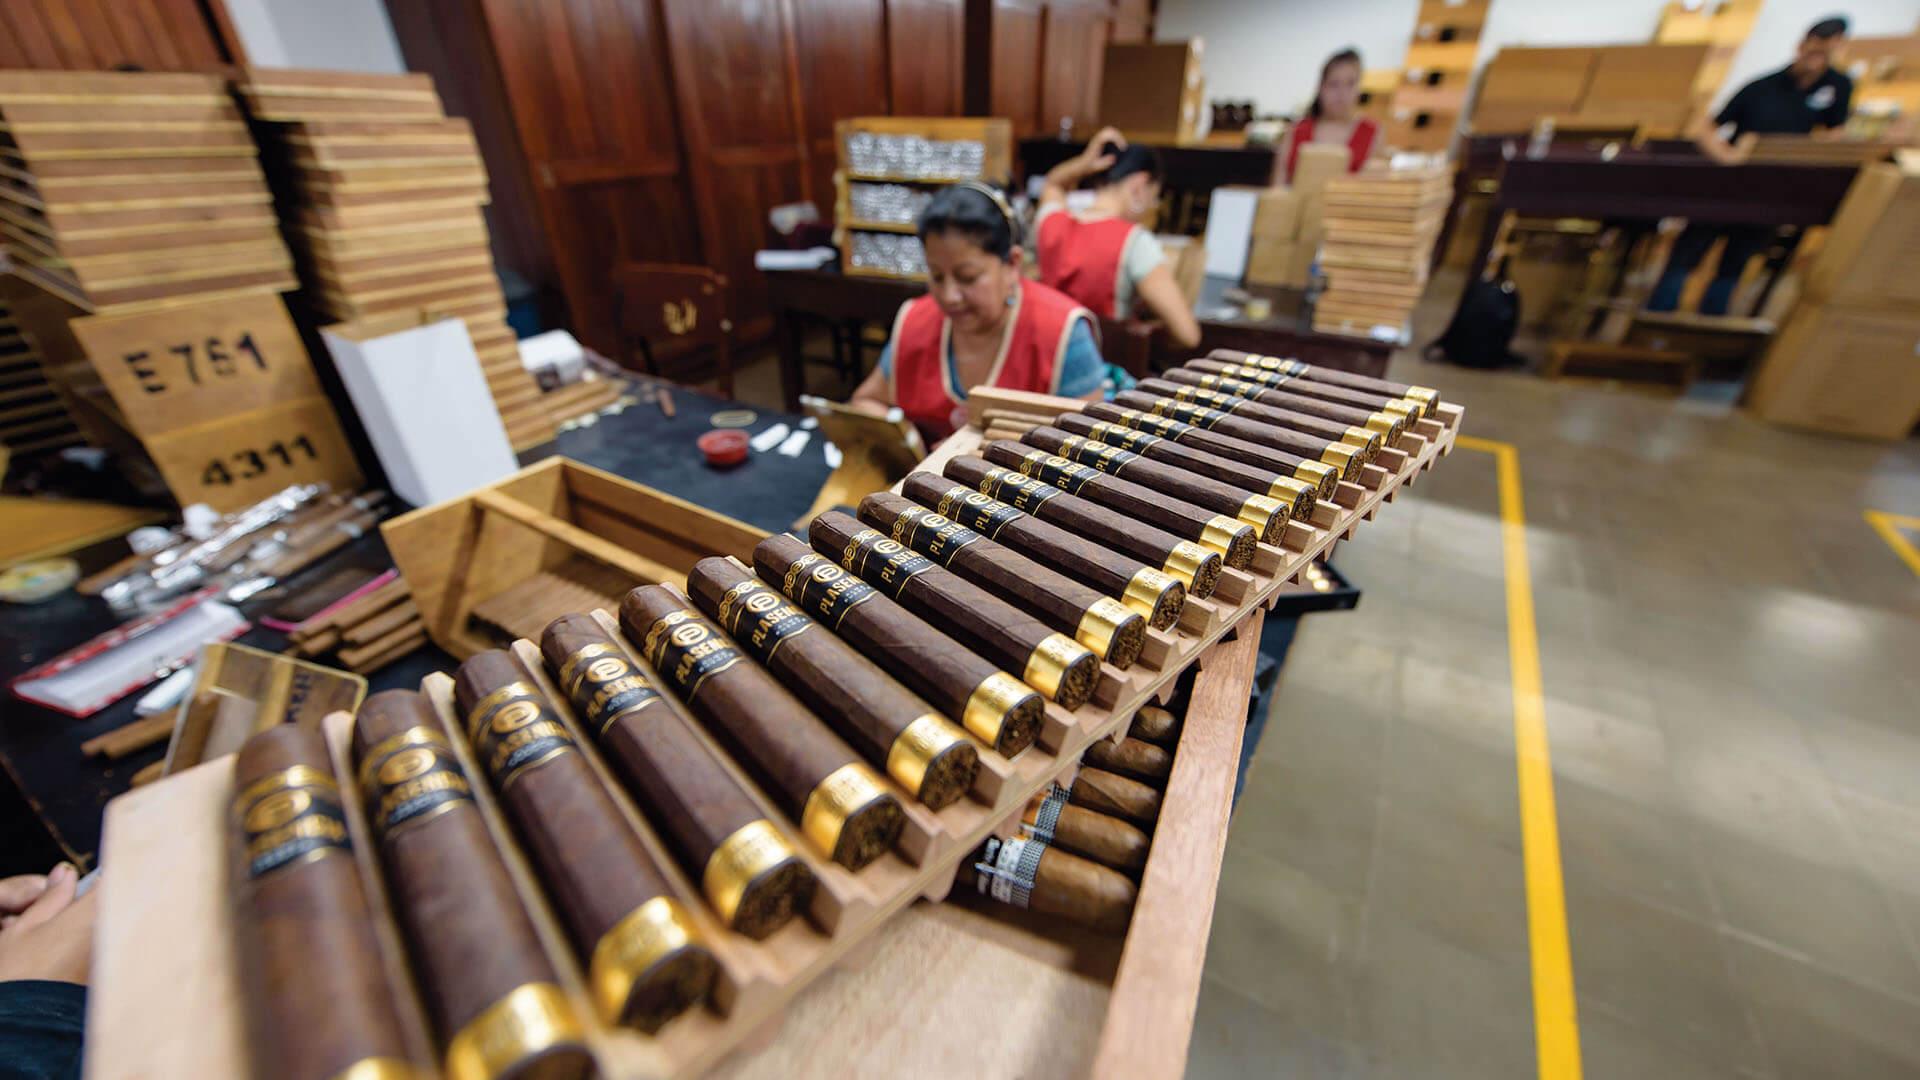 Plasencia Cigars - 2015 photo